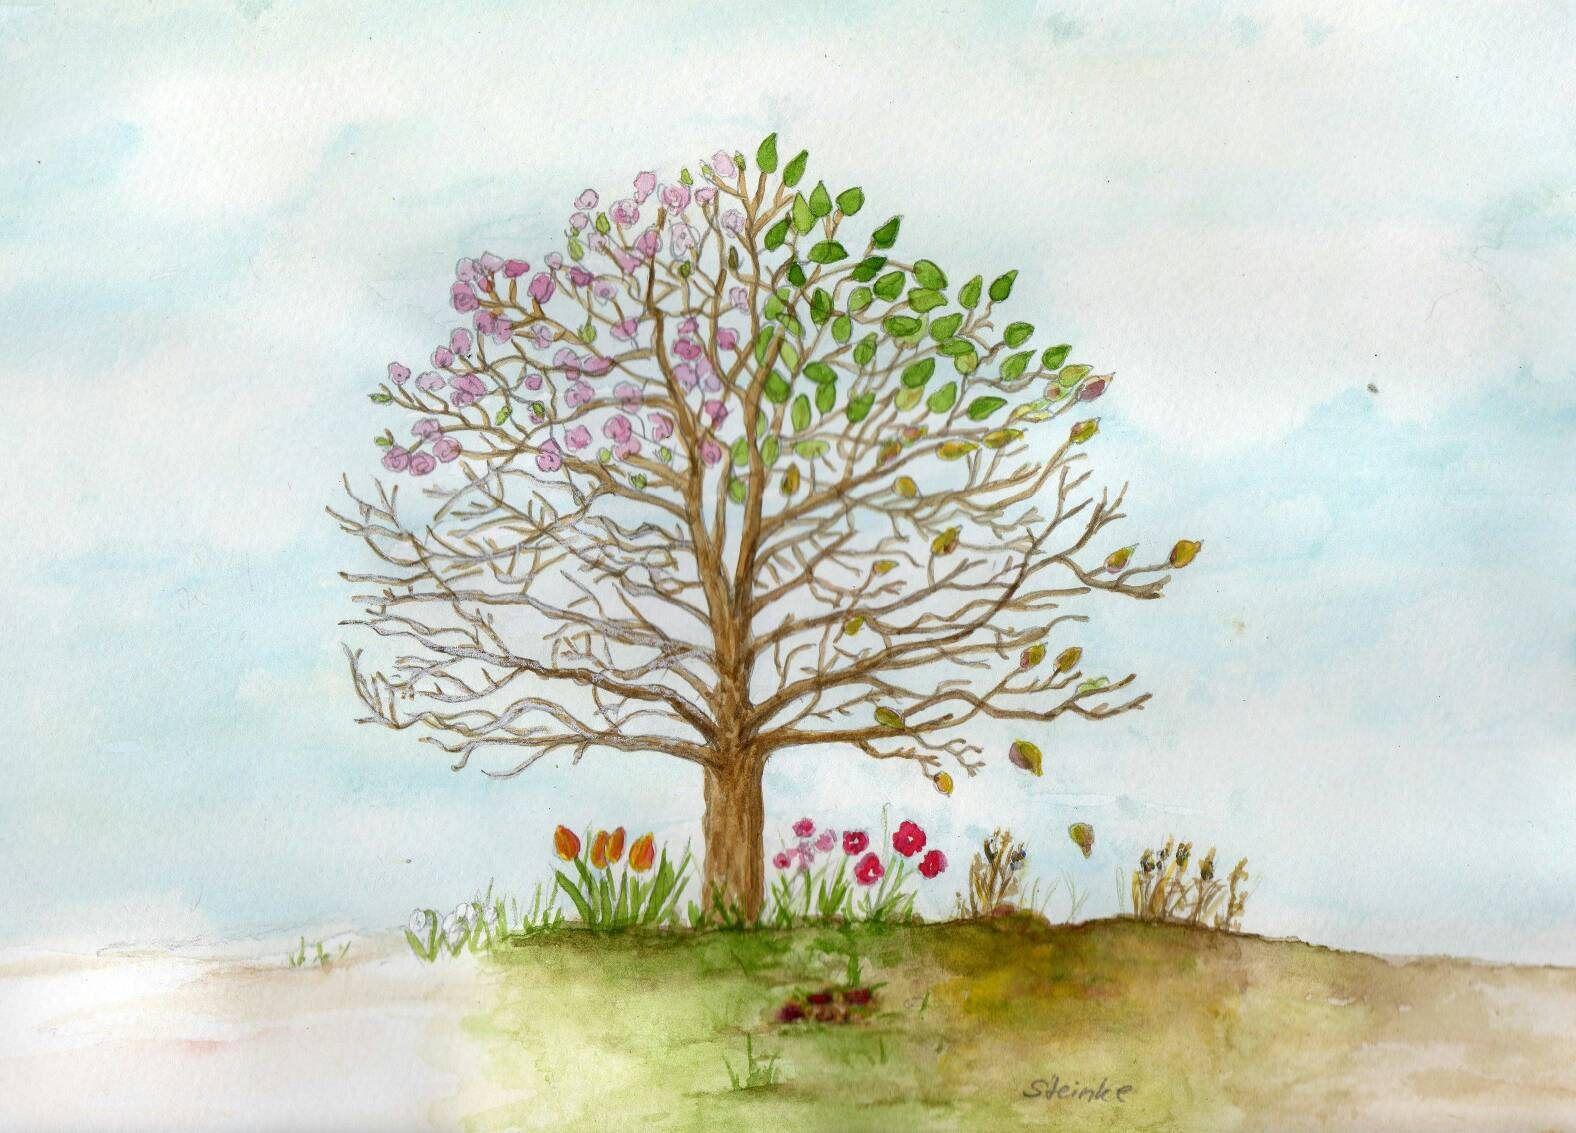 Vier Jahreszeiten Baum Original Aquarellmalerei Etsy Watercolour Painting Painting Original Watercolor Painting